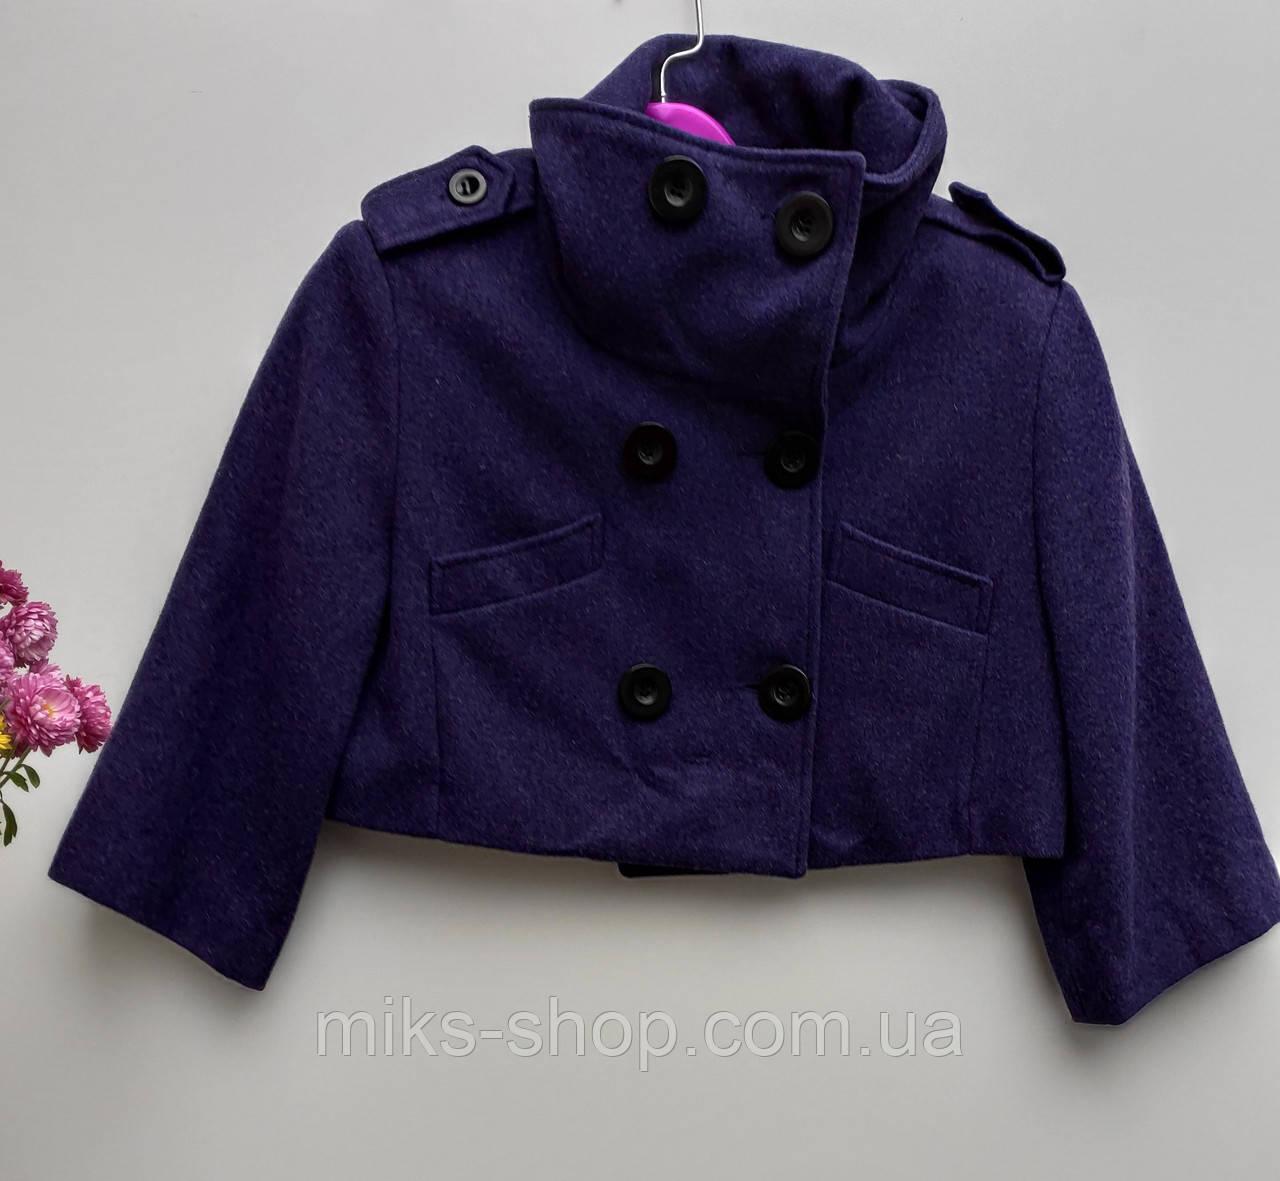 Кашемірове коротеньке пальто Розмір S ( Б-227)